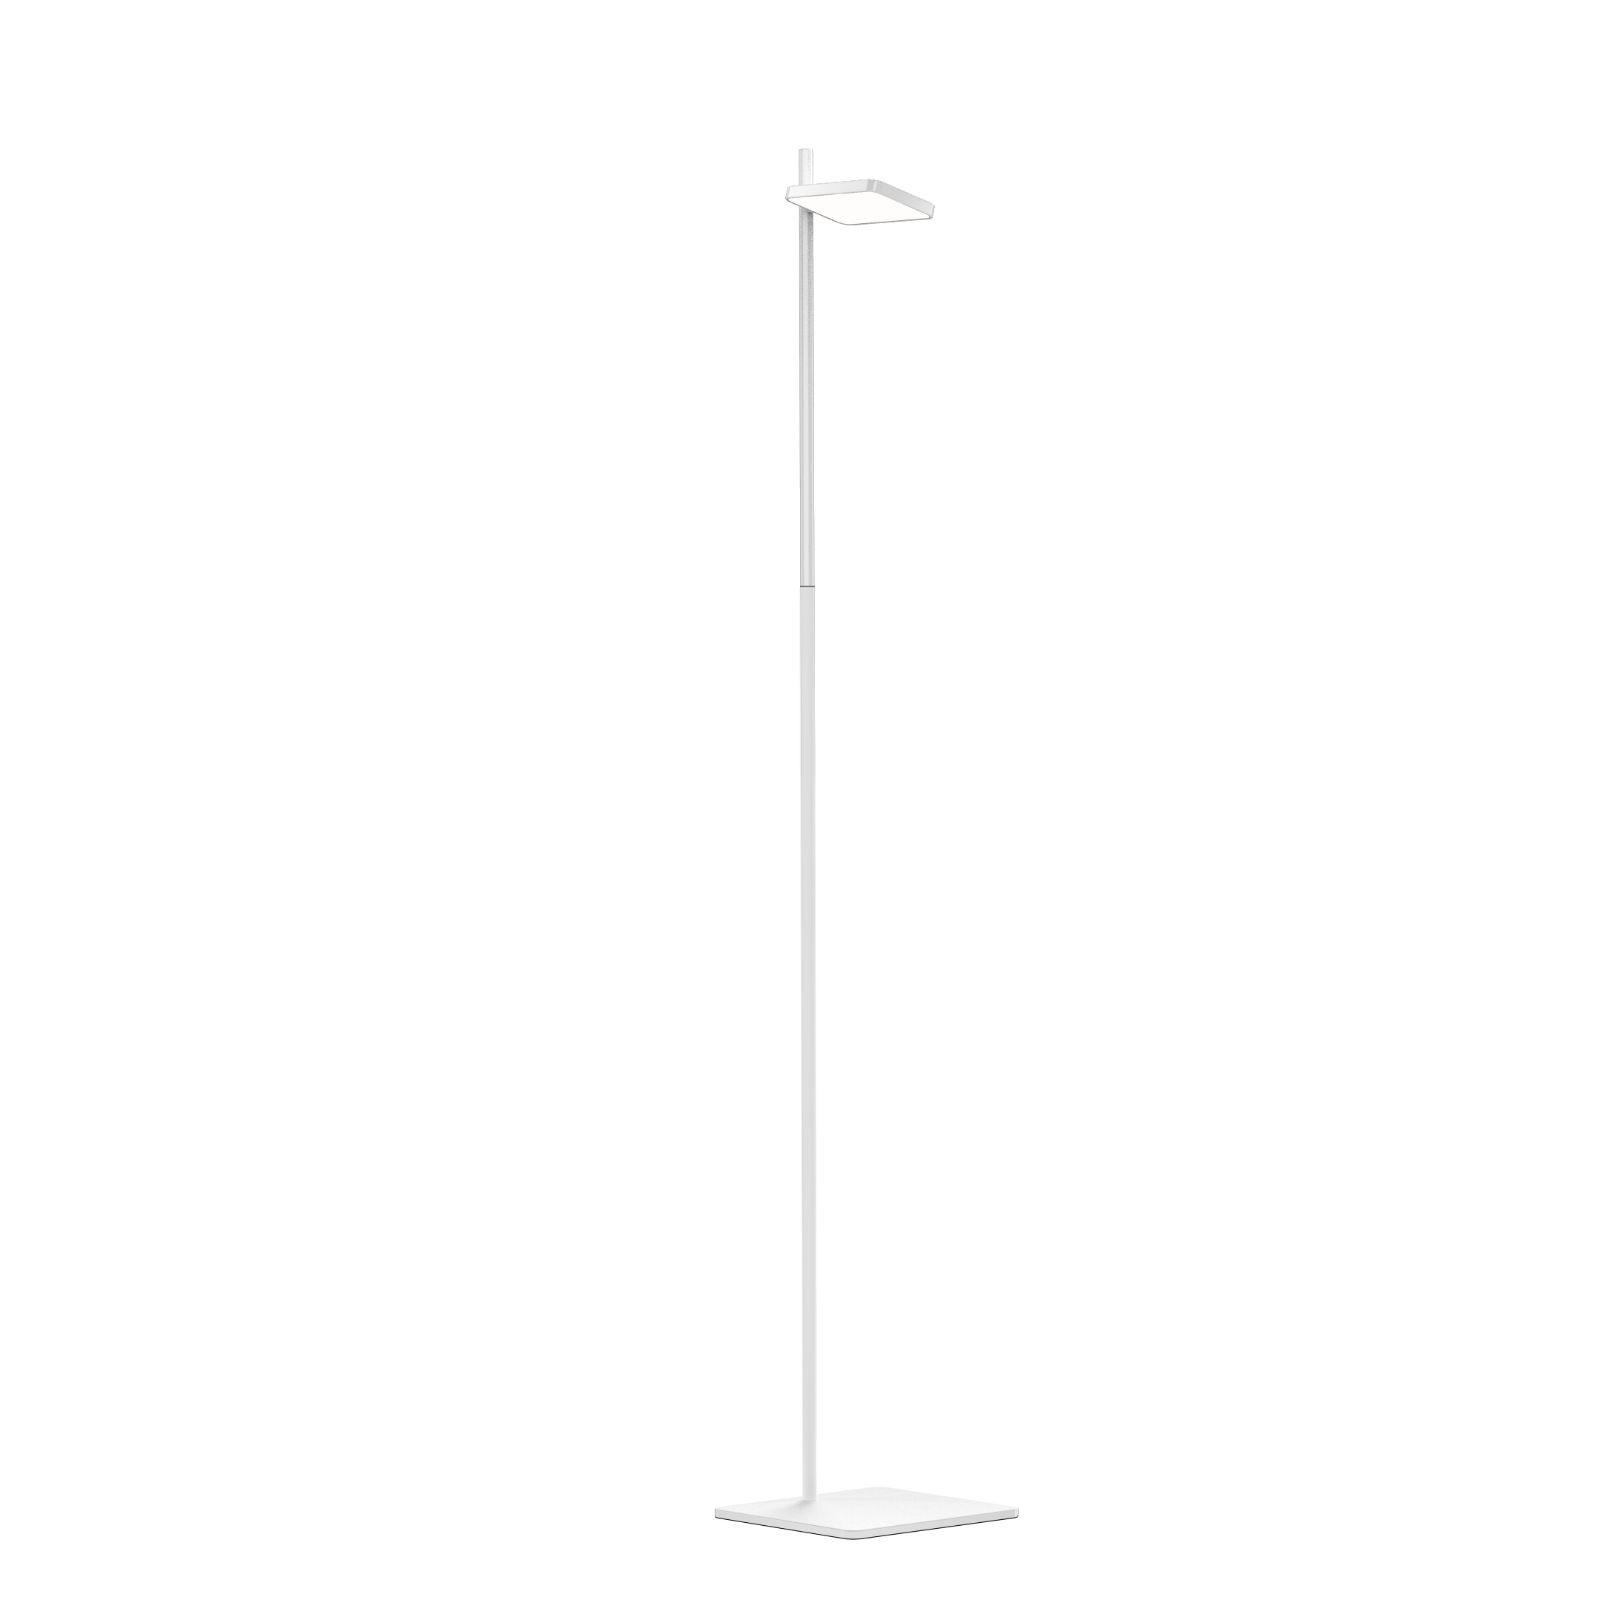 TALIA Φωτιστικό Δαπέδου LED (Λευκό) - Pablo Designs